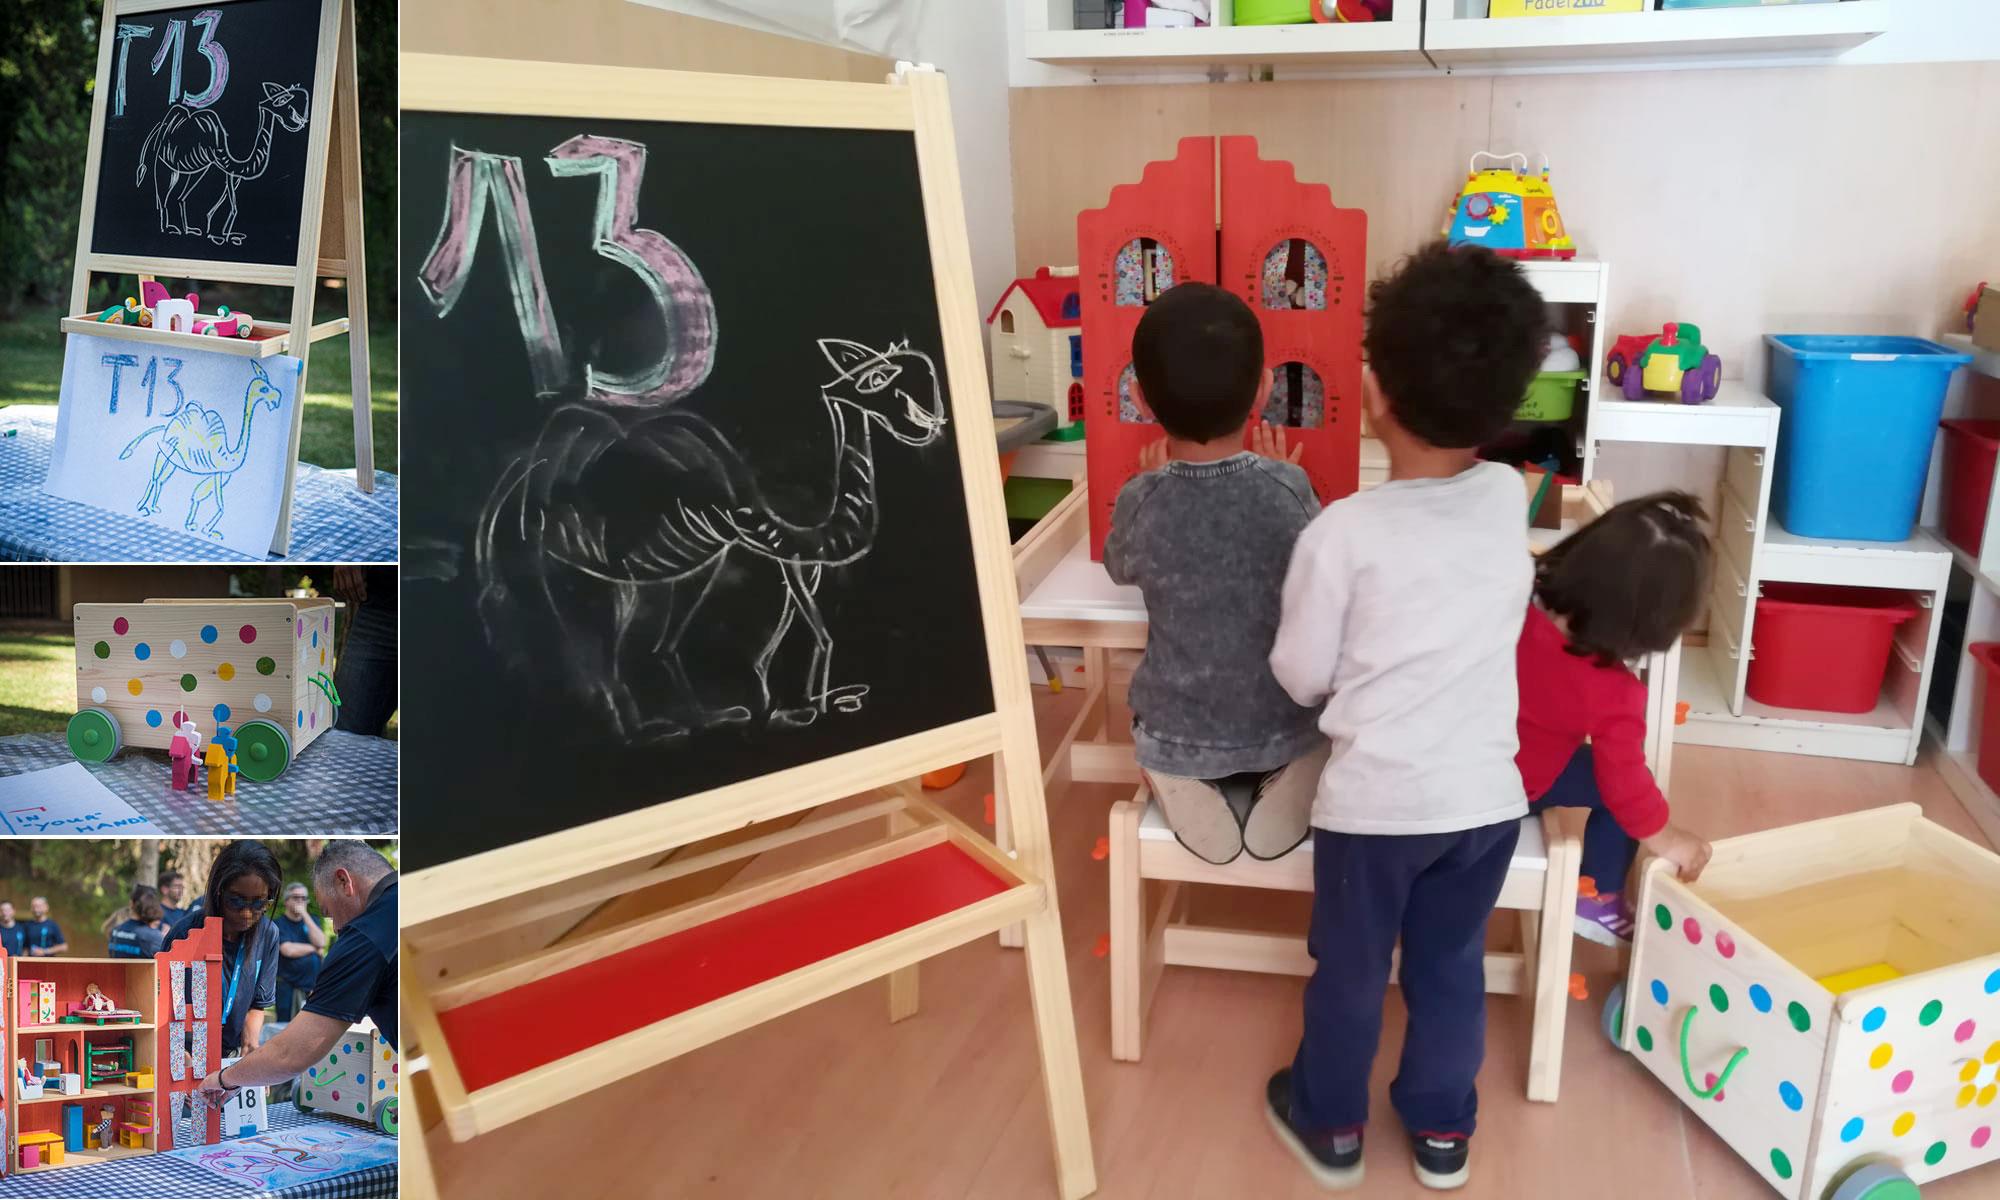 juguetes-rsc-1-exploramas